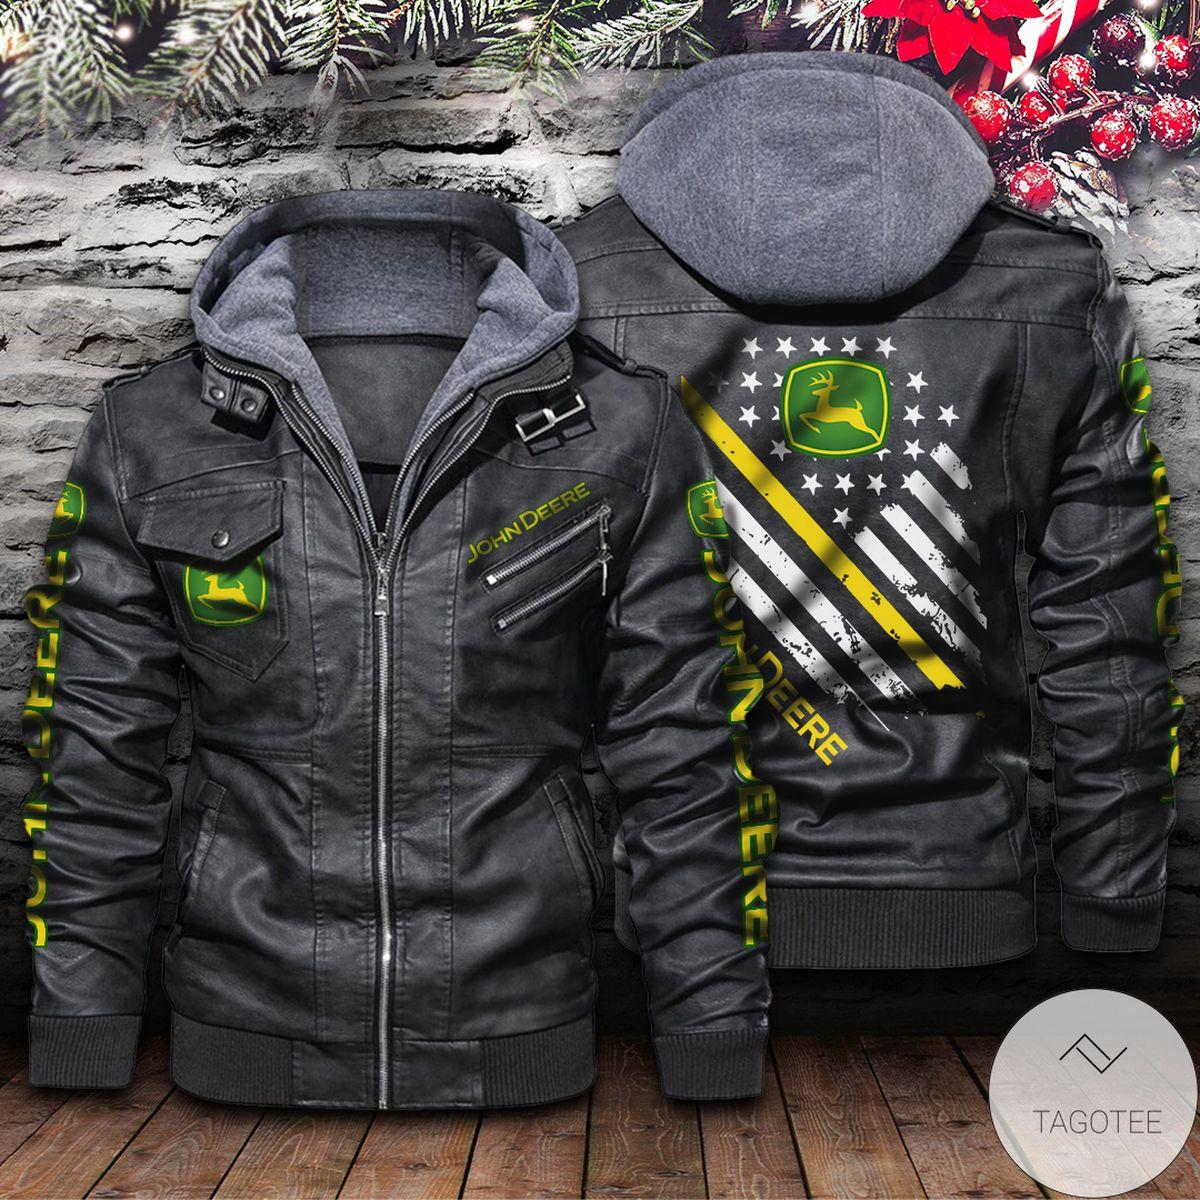 Personalized John Deere Leather Jacket